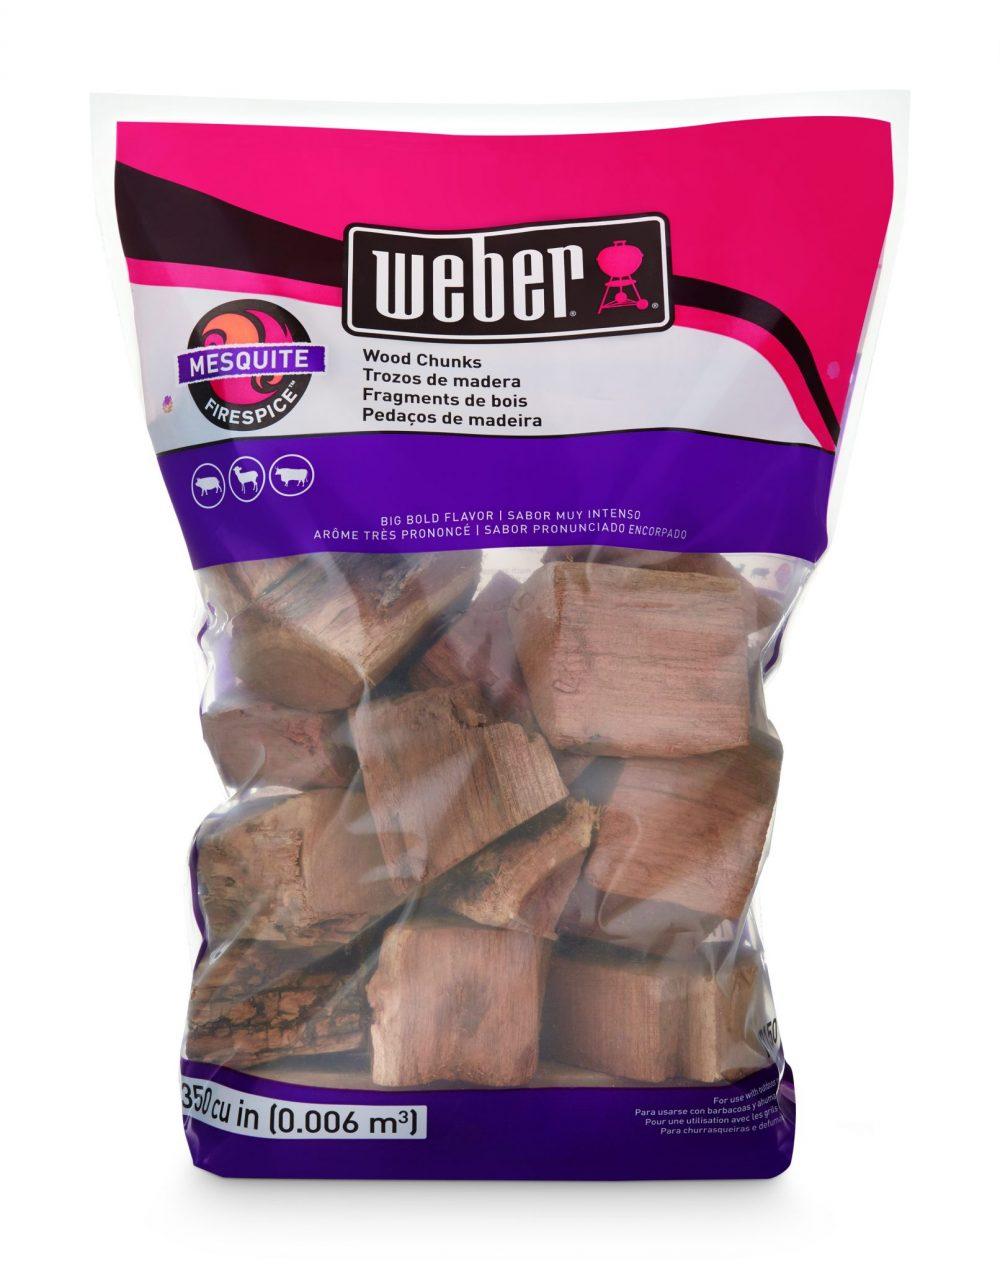 Weber® Firespice Smoking Wood Chunks - Mesquite- 1.8 kg